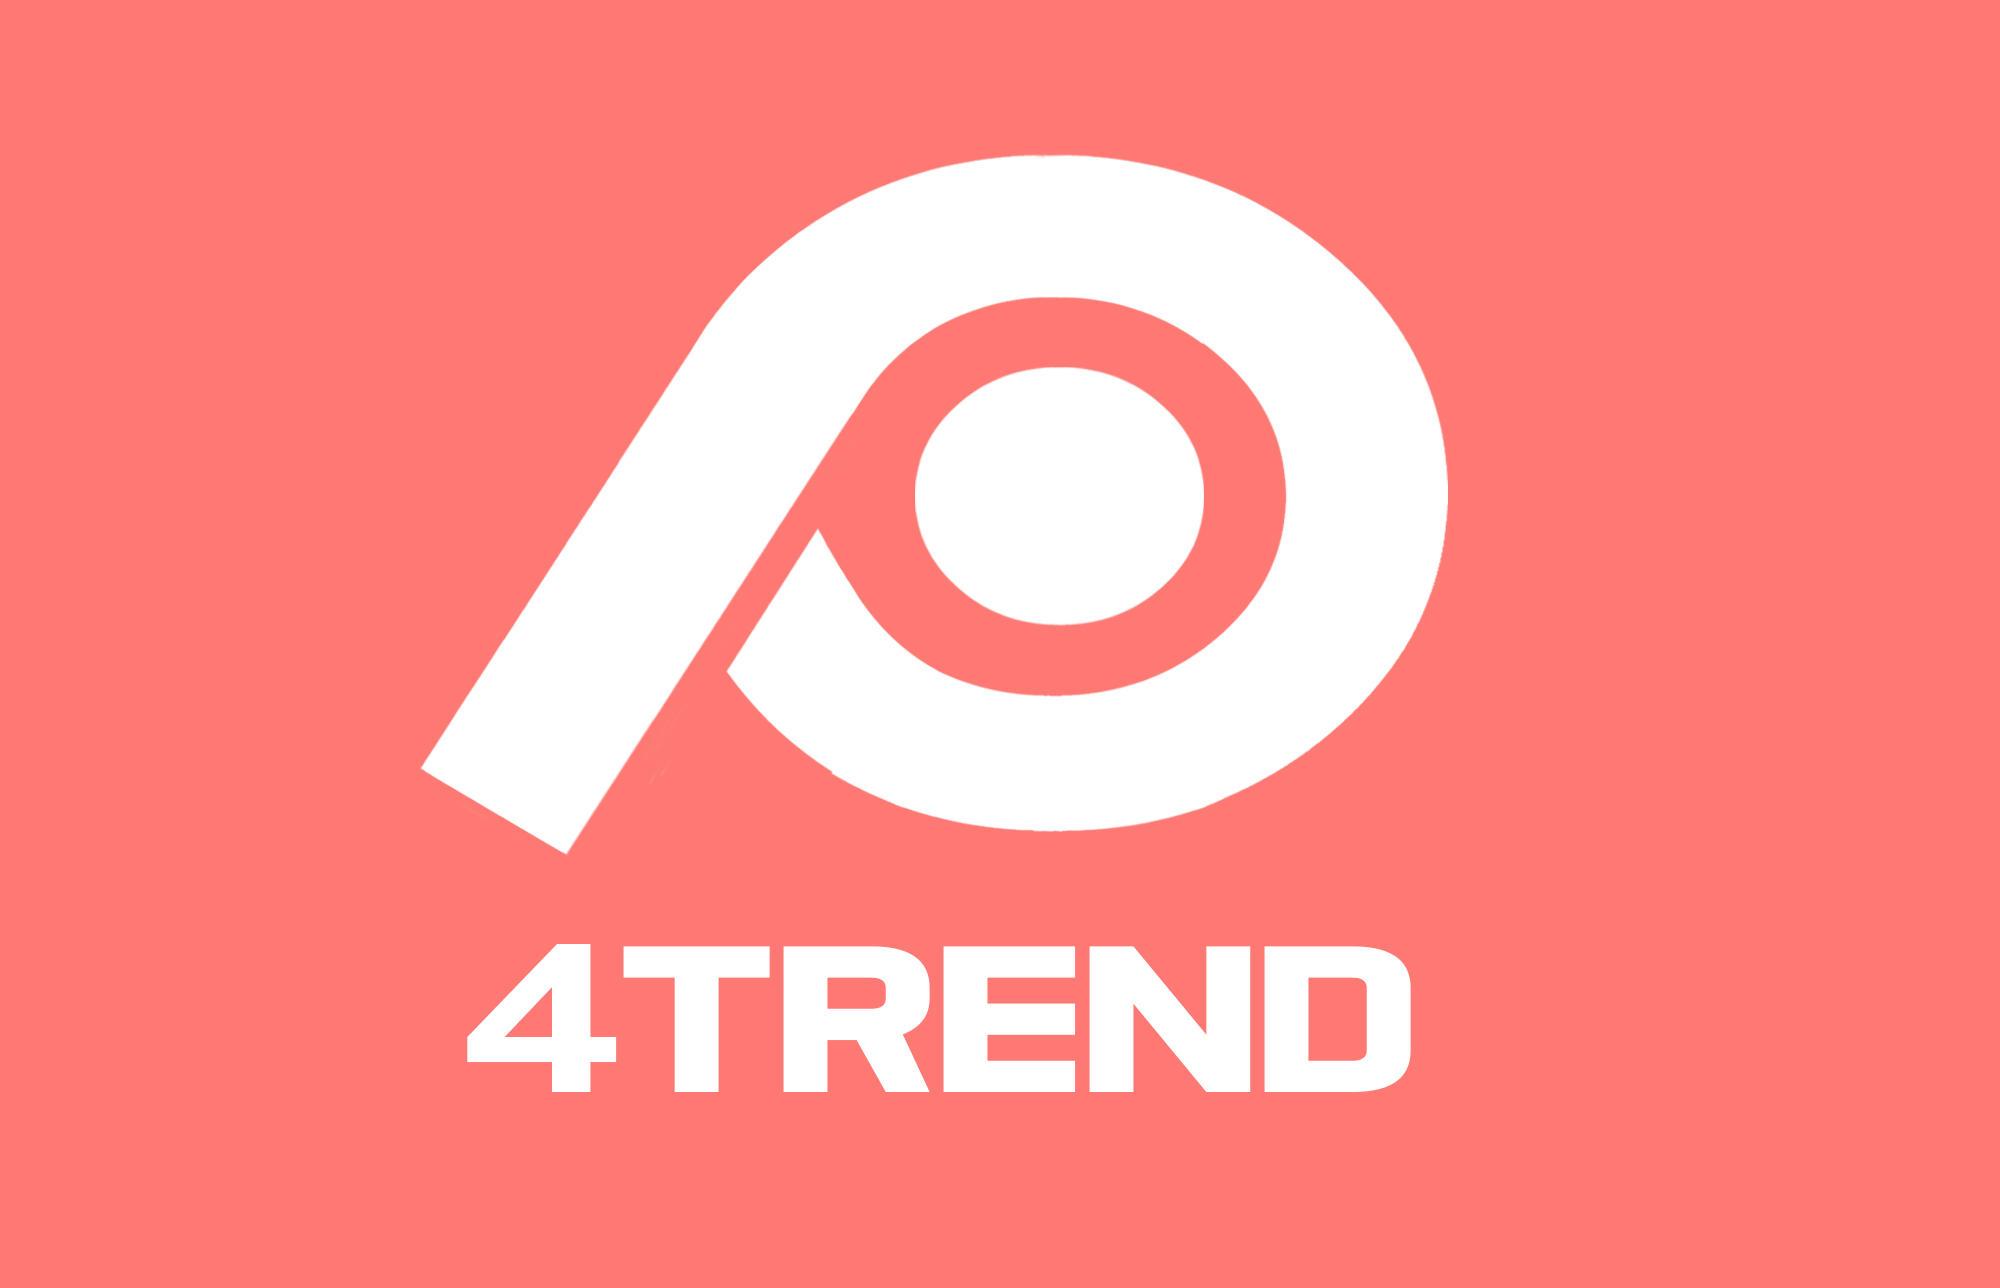 Магазин 4 Trend